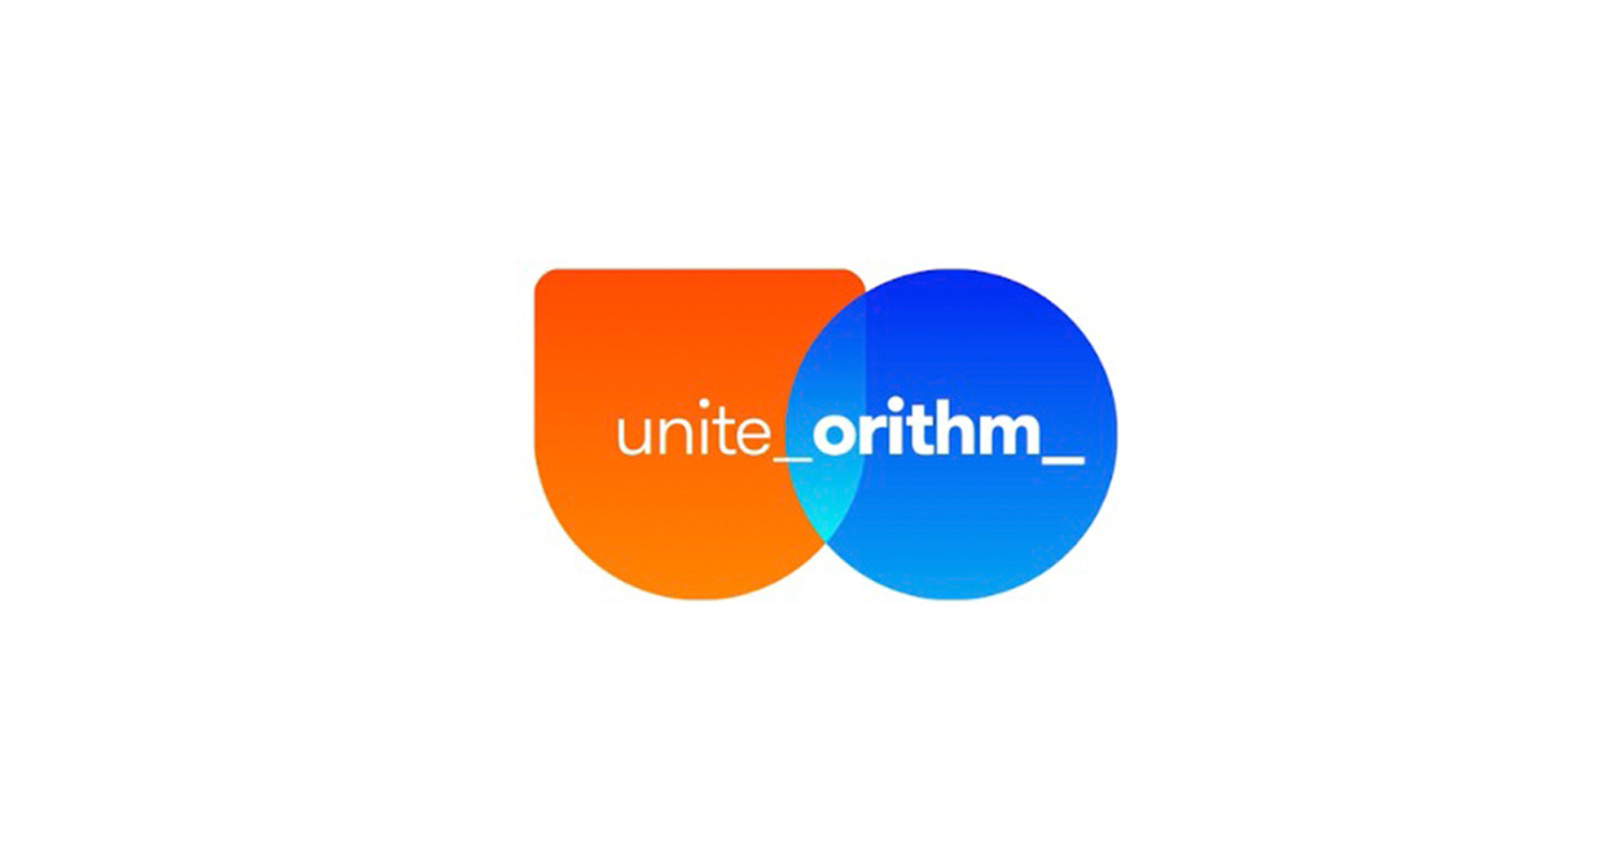 Unite_orithm